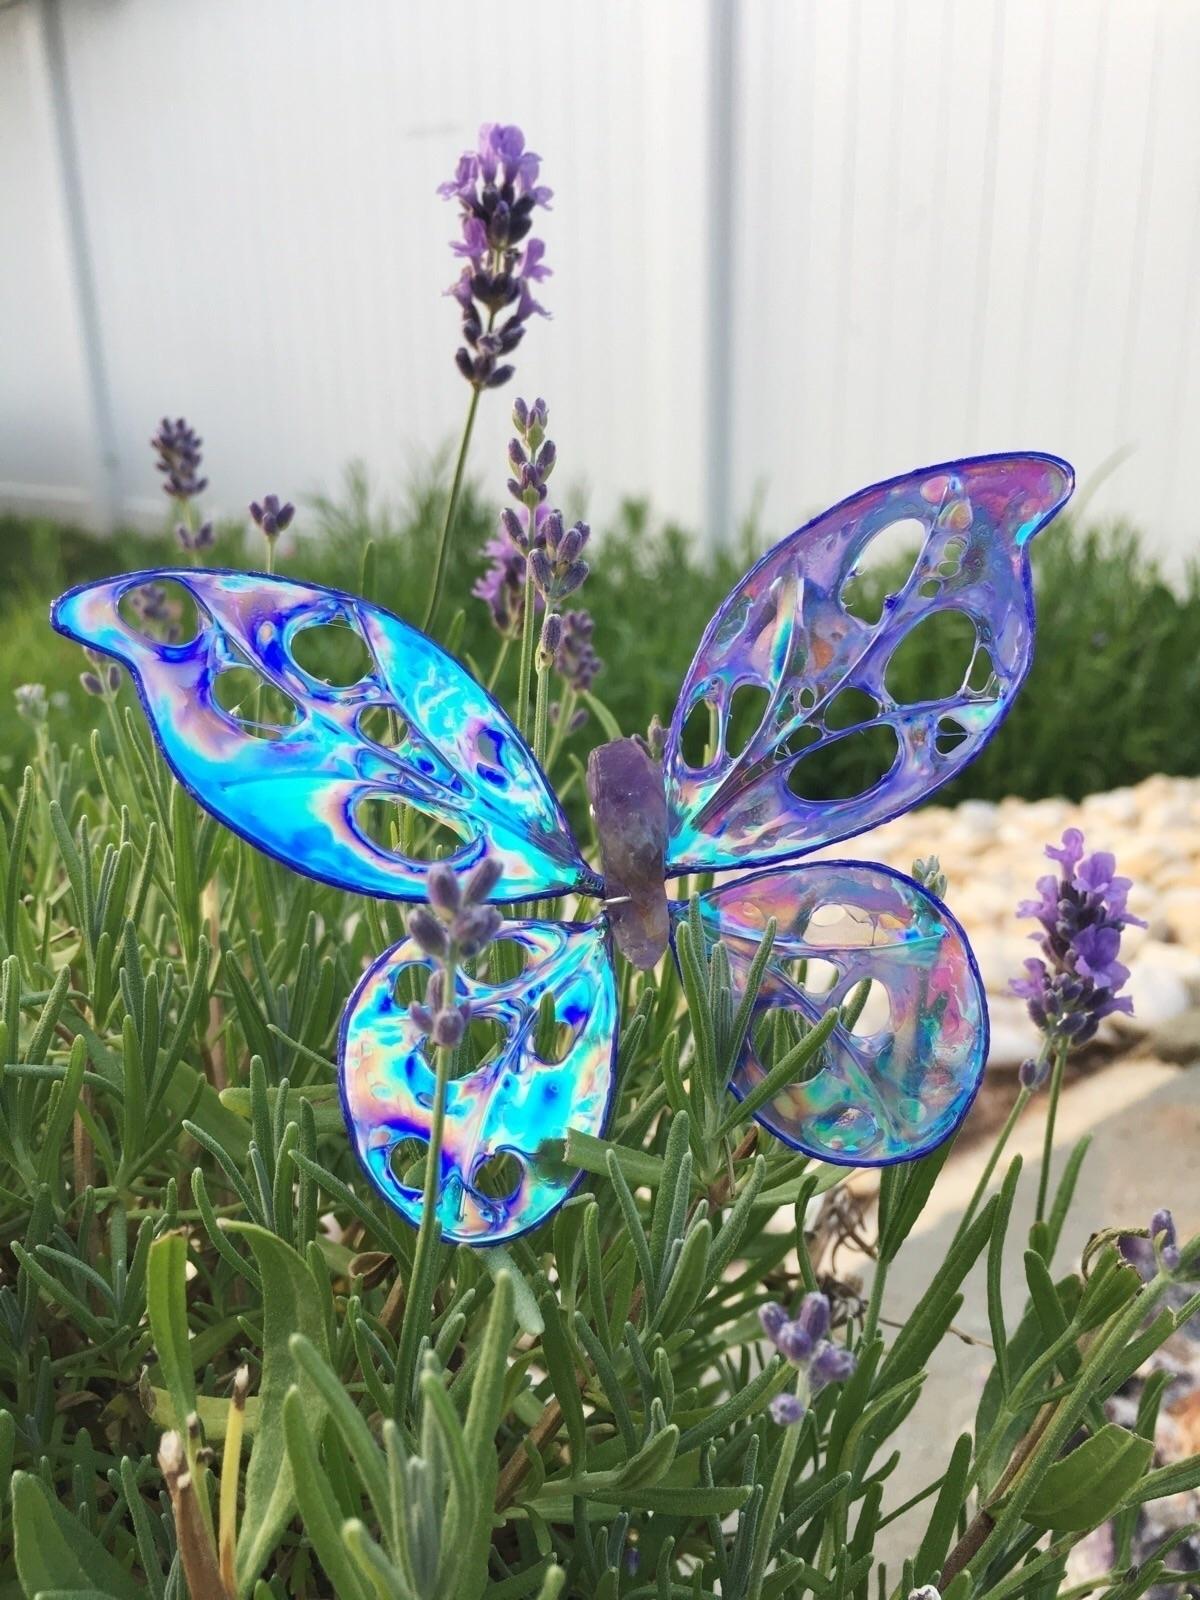 Lavender lavender winged butter - faerieblessings | ello